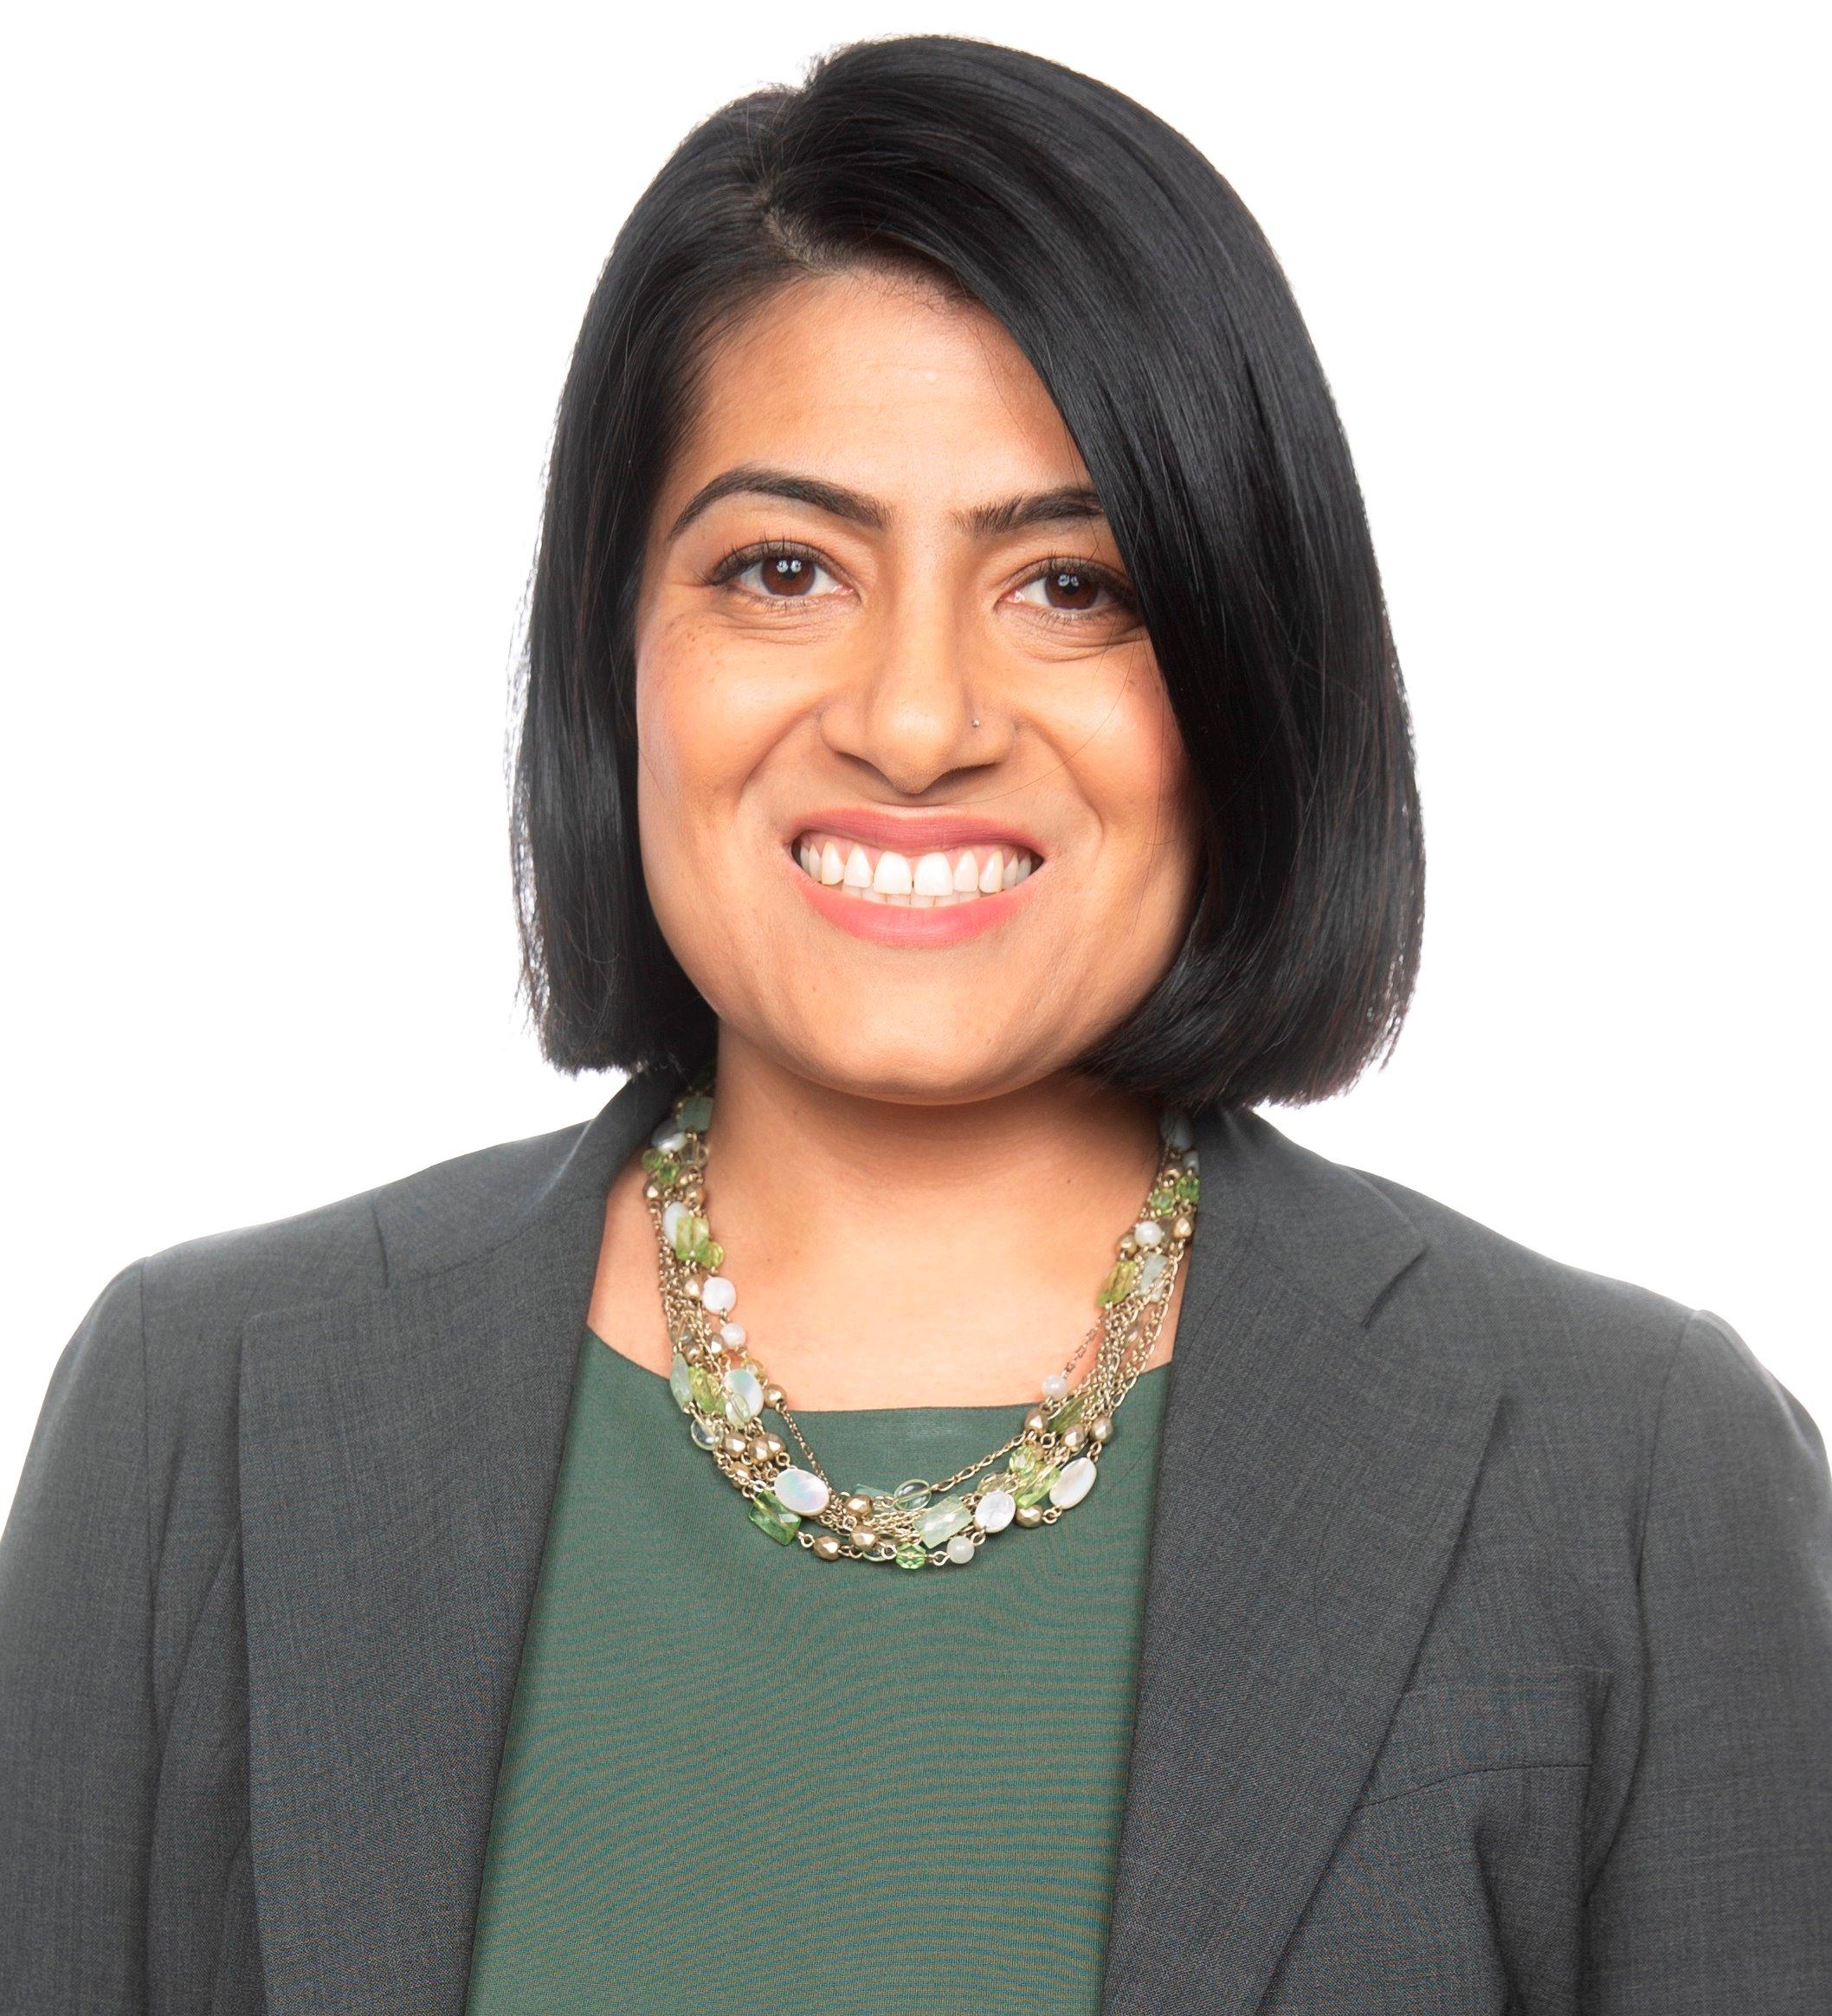 Reena R. Bajowala